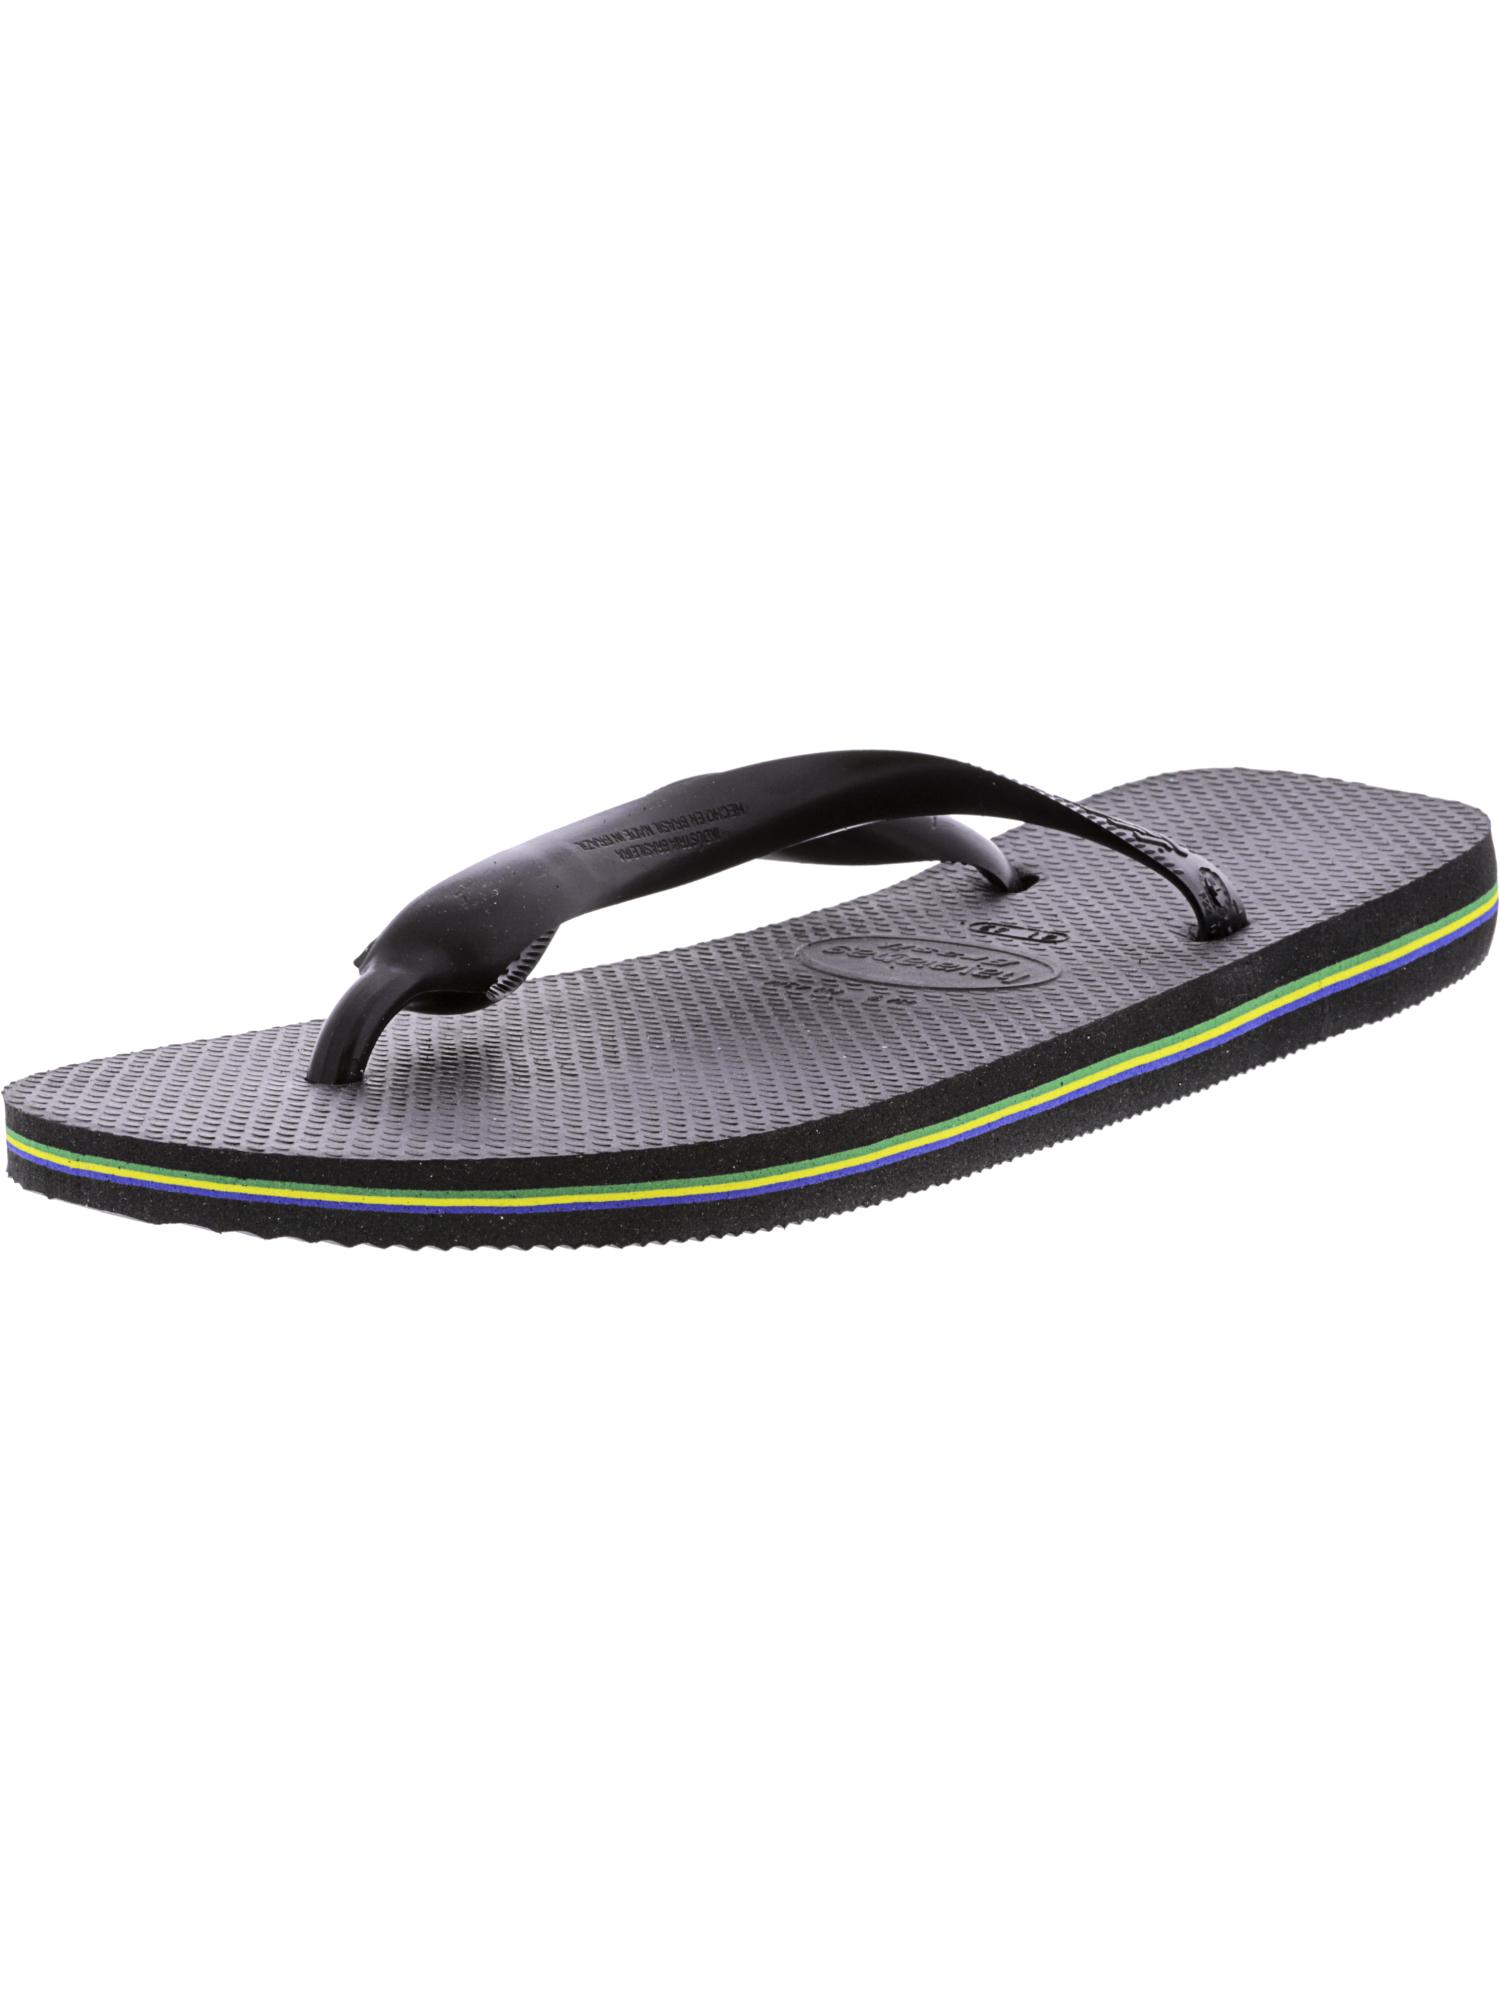 da723a121 Havaianas Womens Brazil Sandal Flip Flop Black 37 Br 7 8 W US